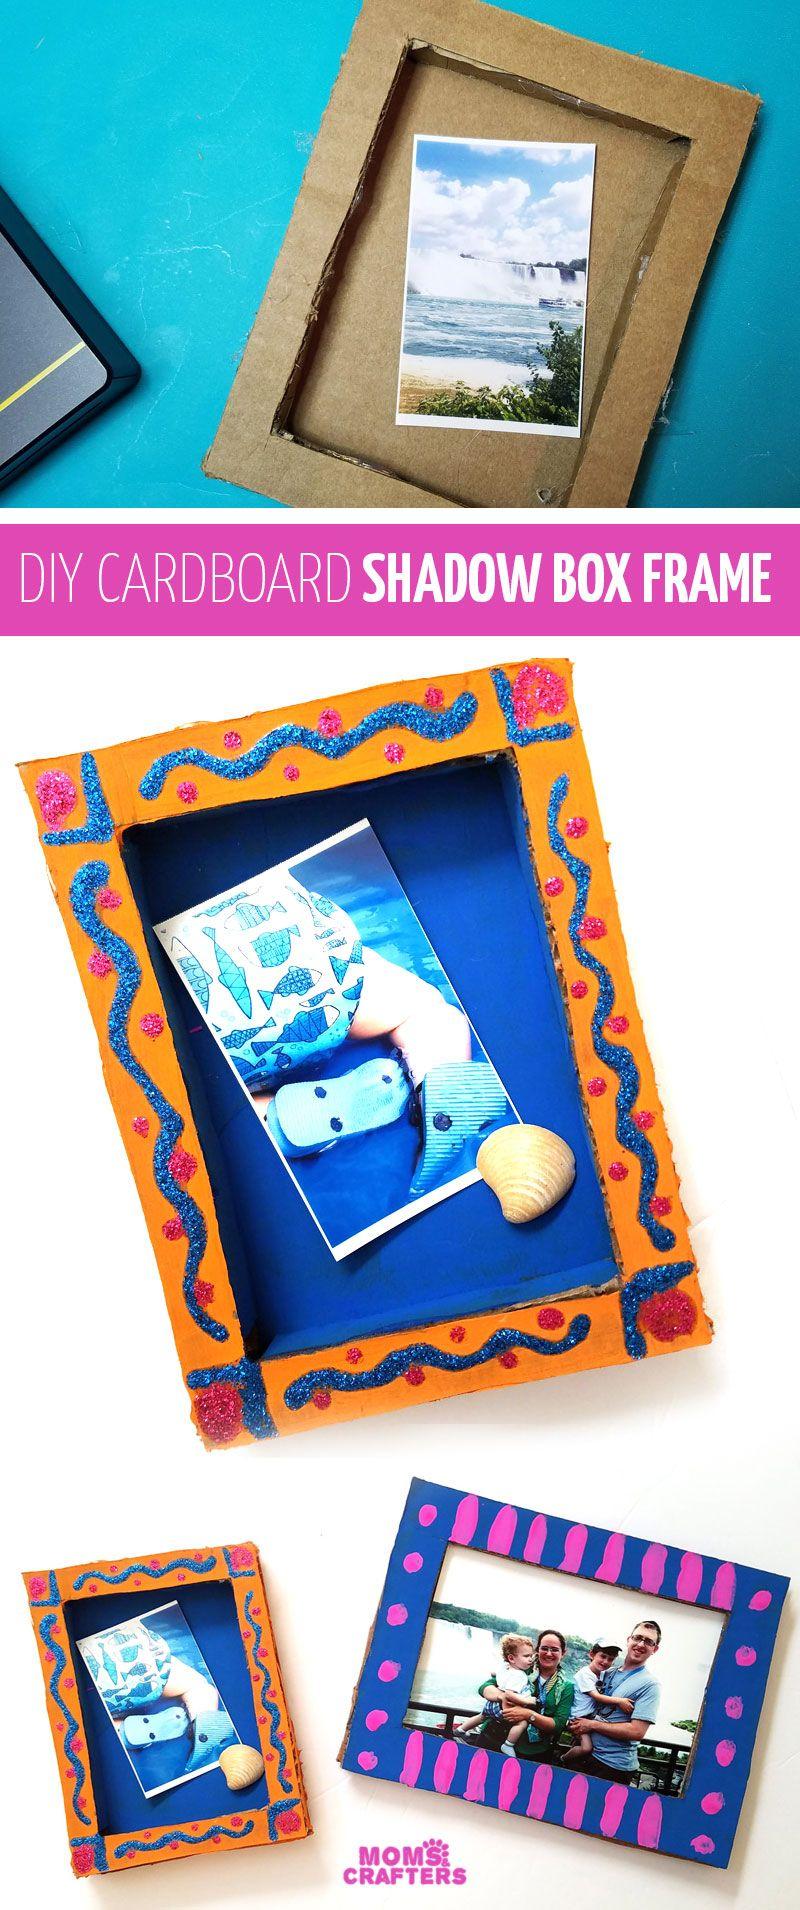 Make onthespot photo gifts Diy shadow box, Box frames